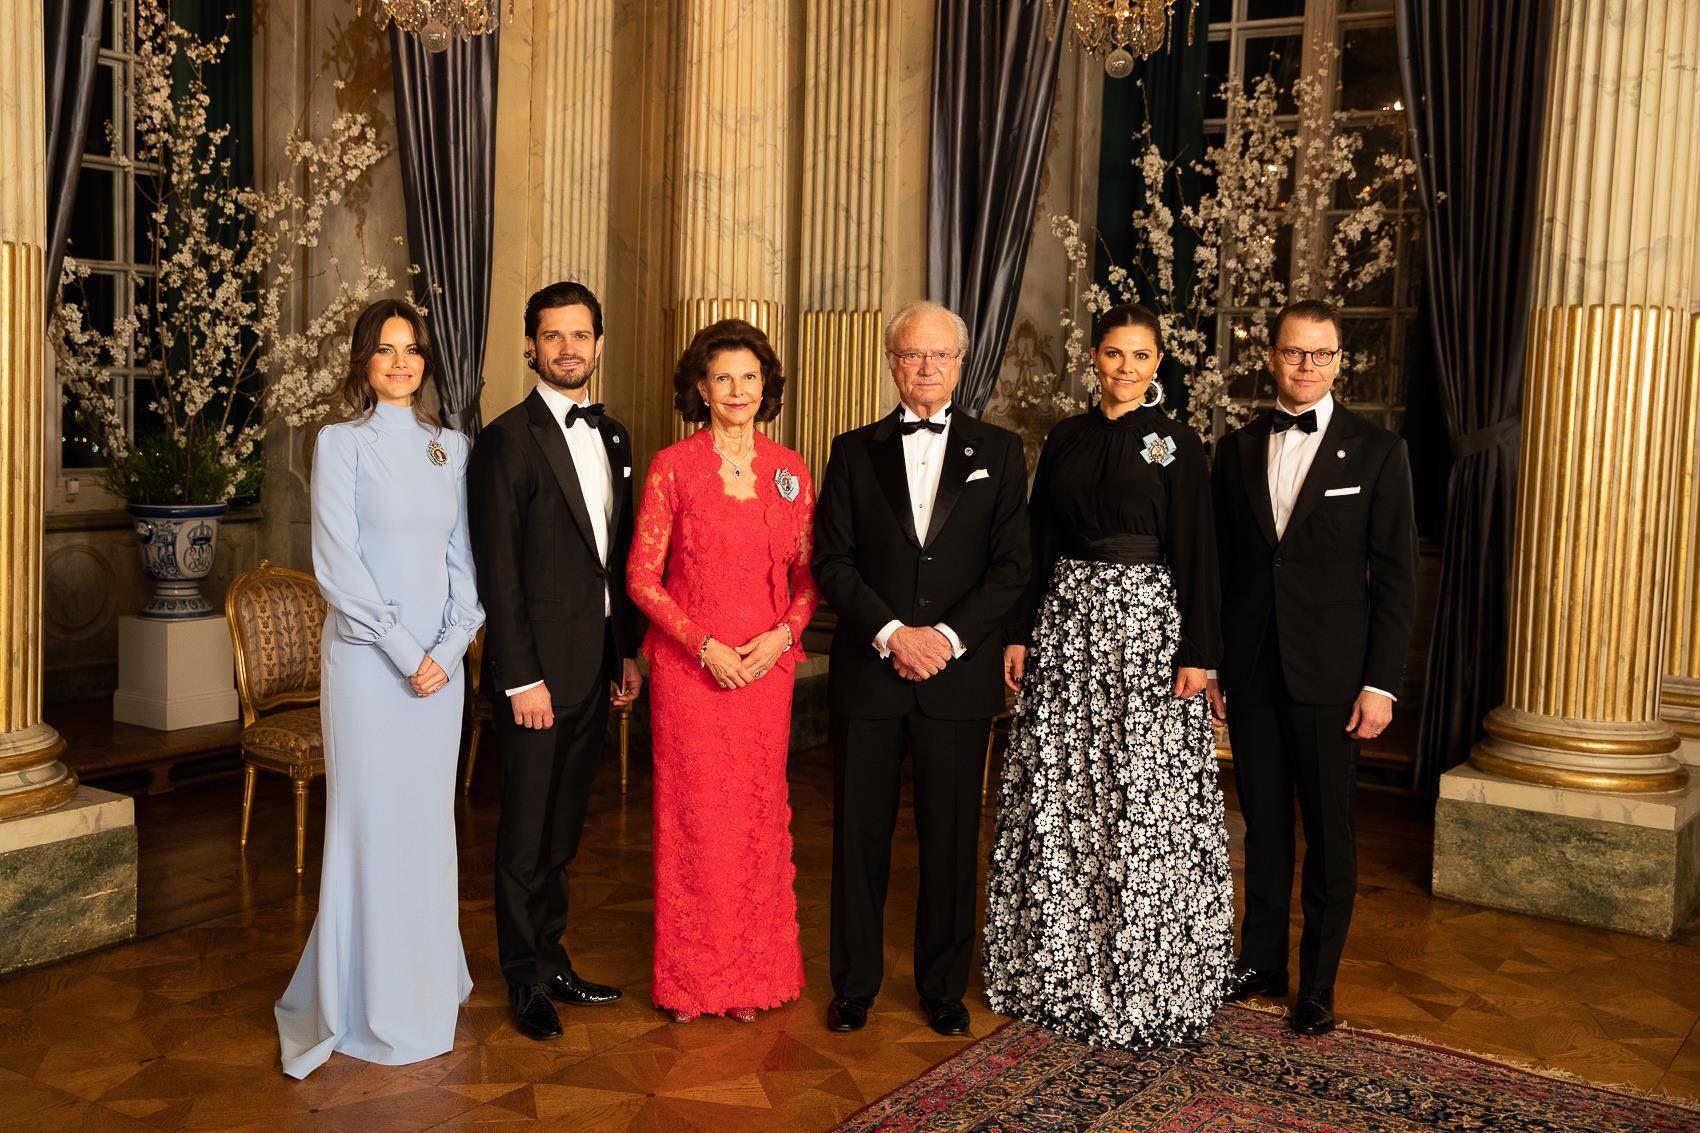 Scandinavian Royals On Twitter Royal Family Swedish Royals Crown Princess Victoria